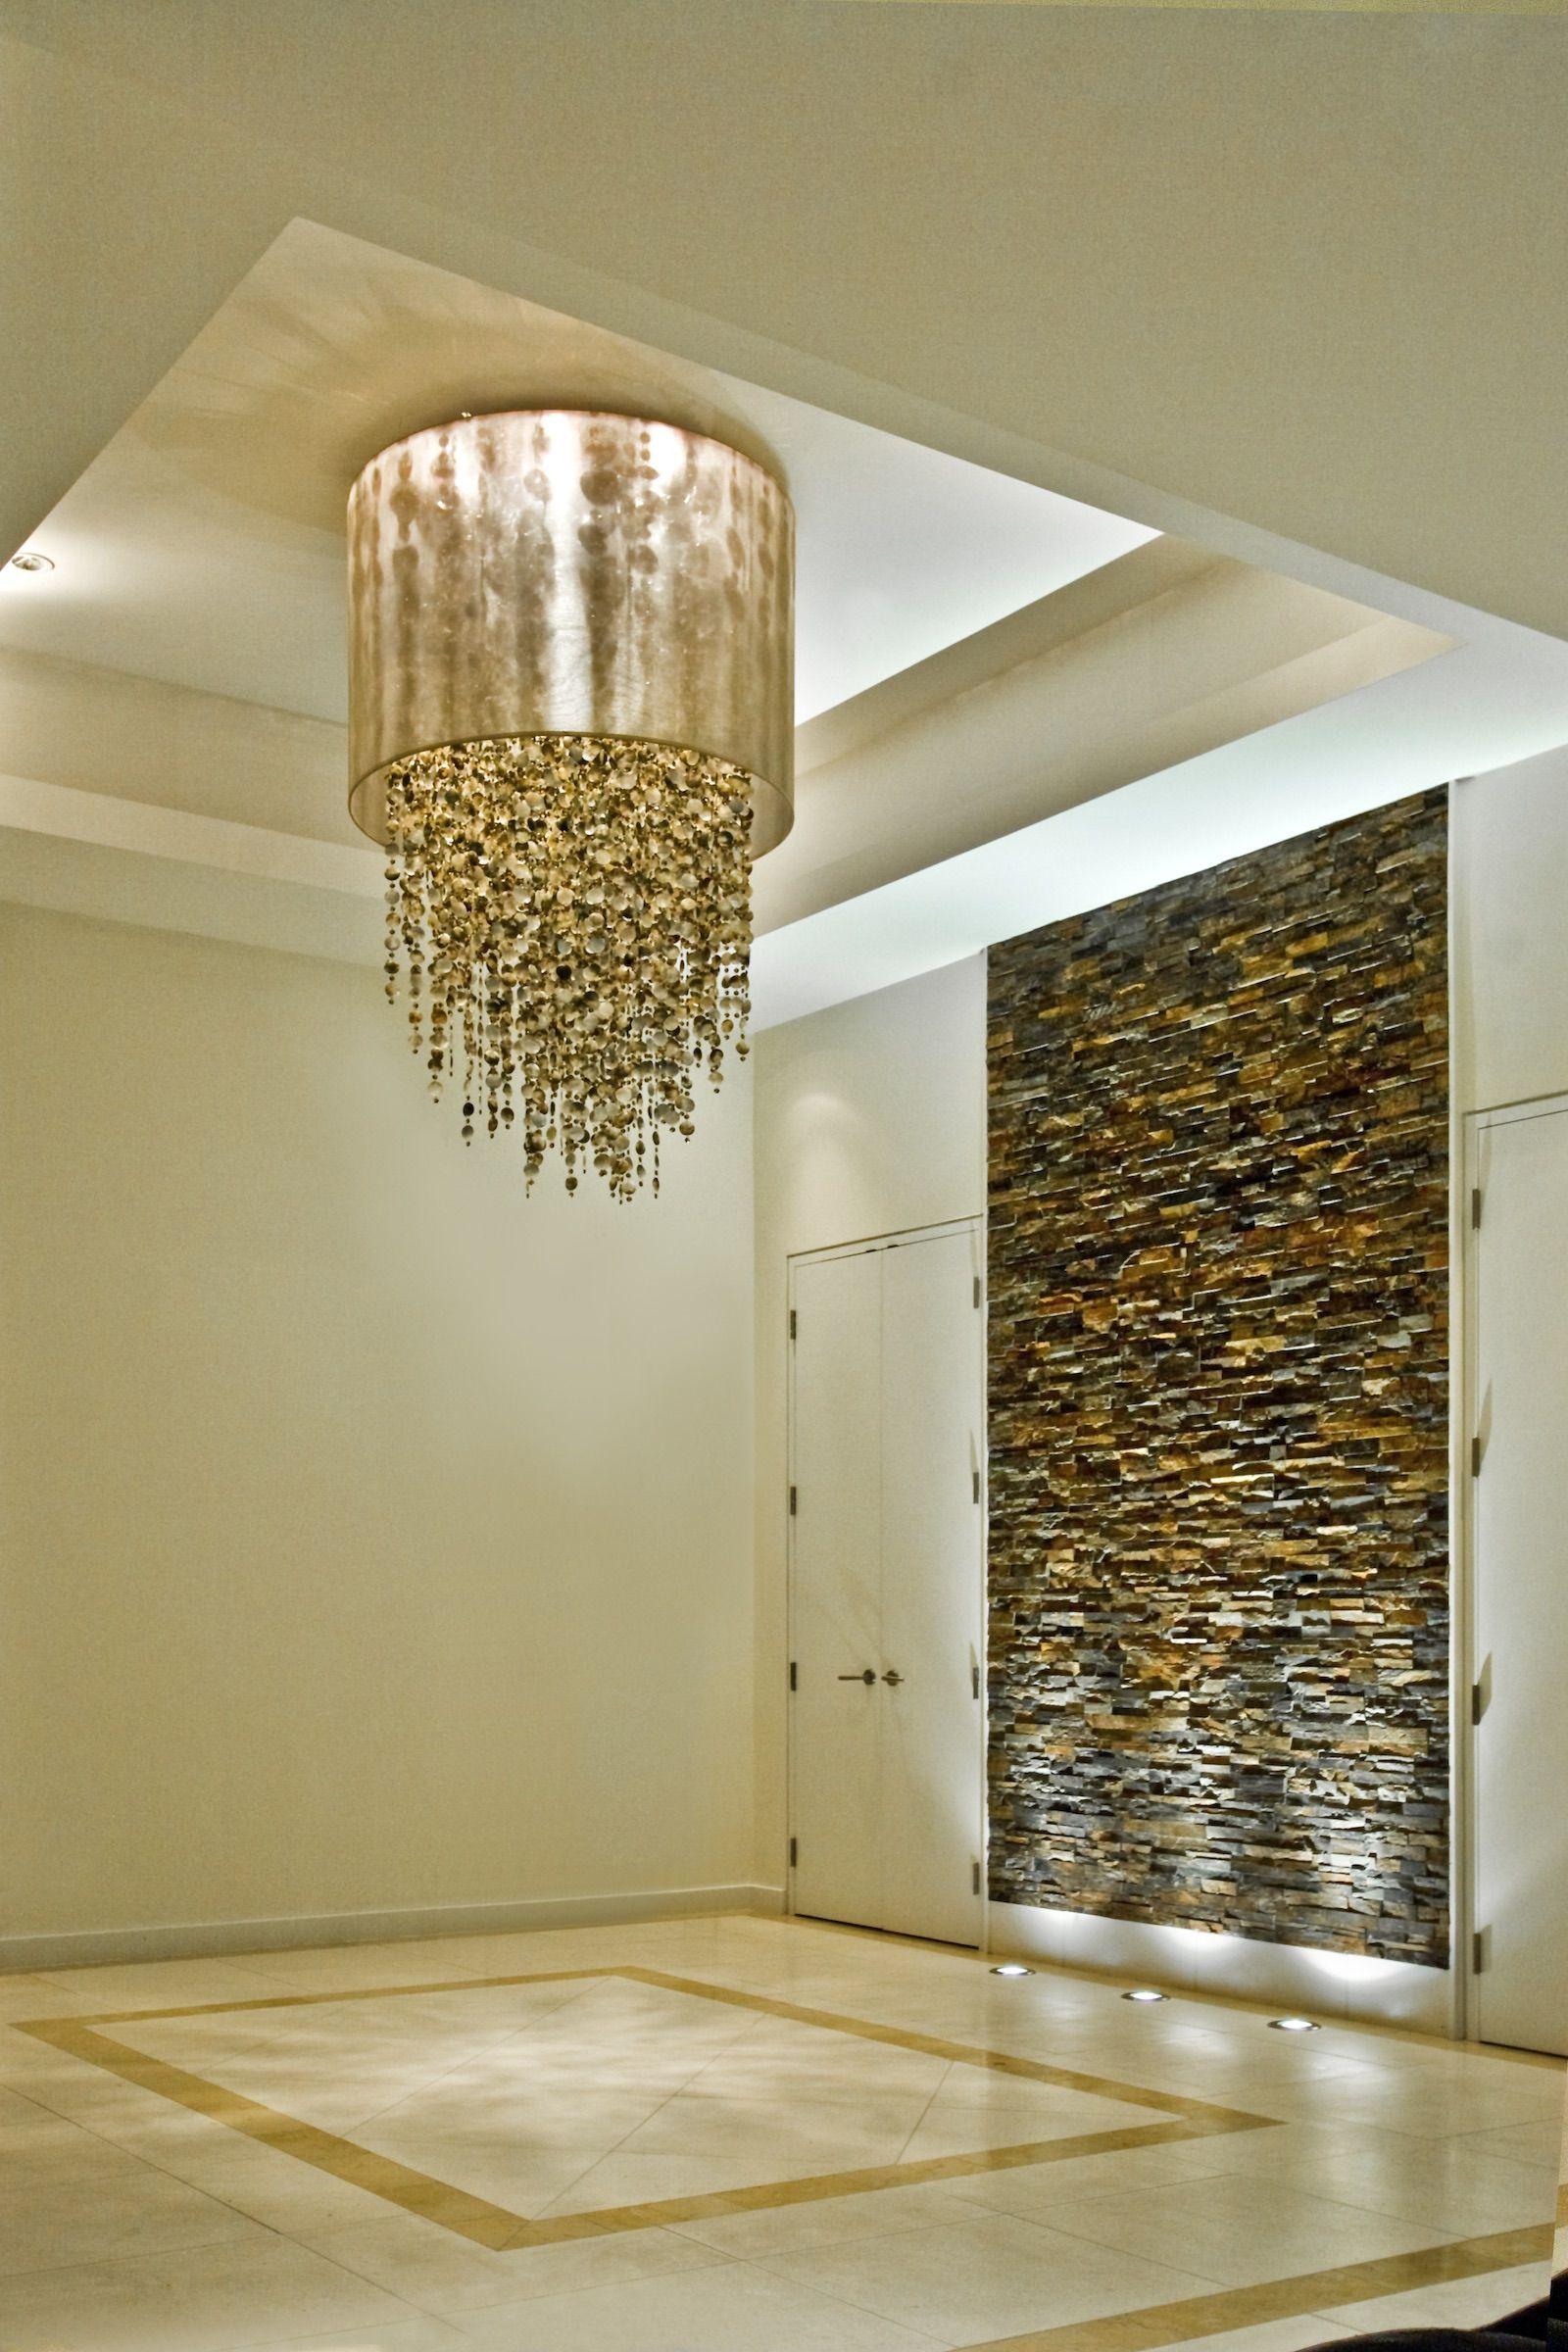 GLOW Coastal Shell Entry Chandelier Crystal Lighting